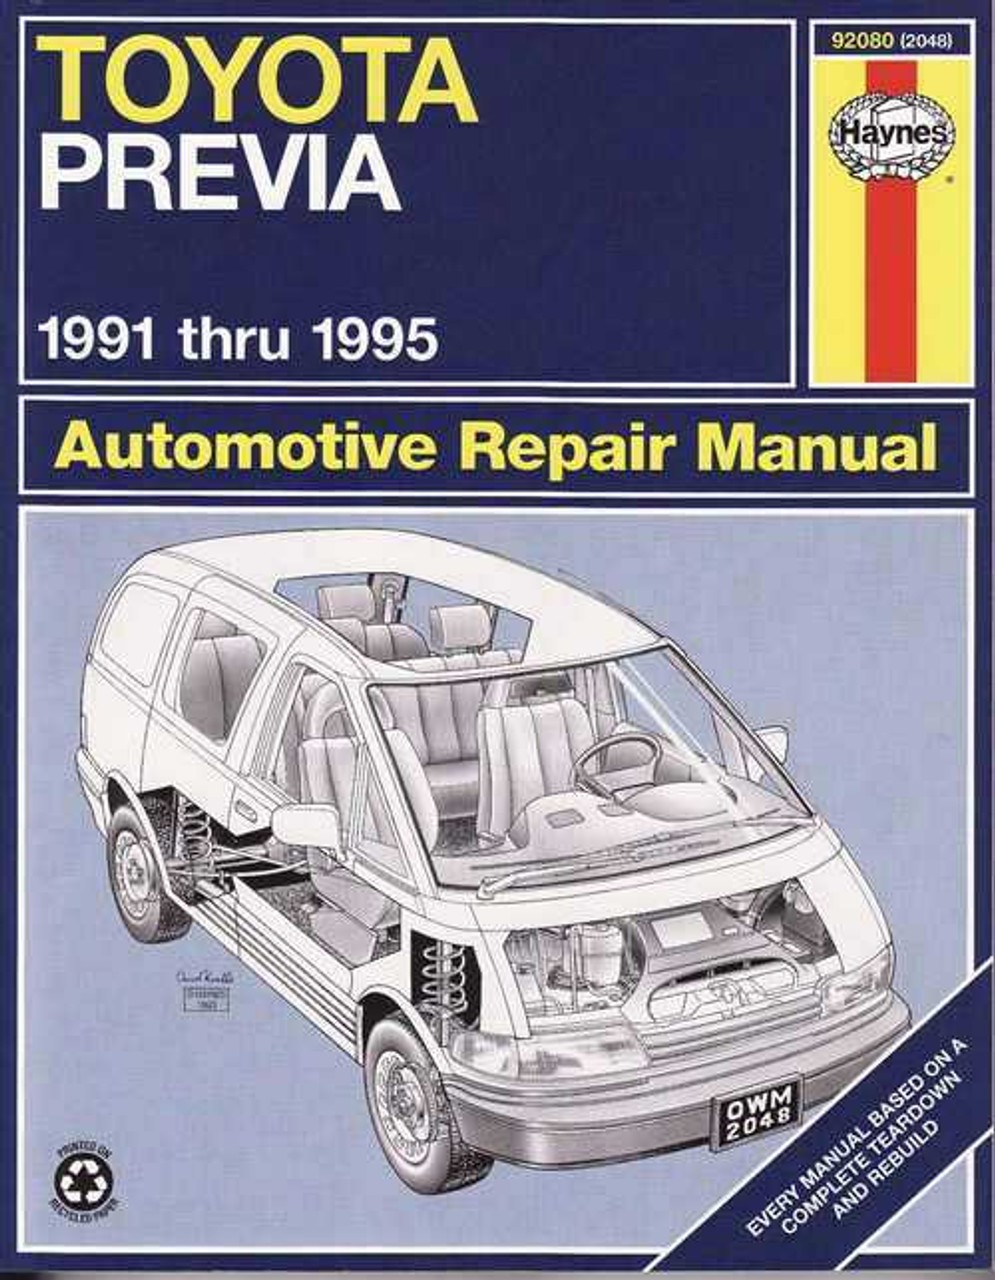 toyota tarago previa 1991 1995 workshop manual rh automotobookshop com au 2002 toyota tarago workshop manual 1991 toyota tarago workshop manual